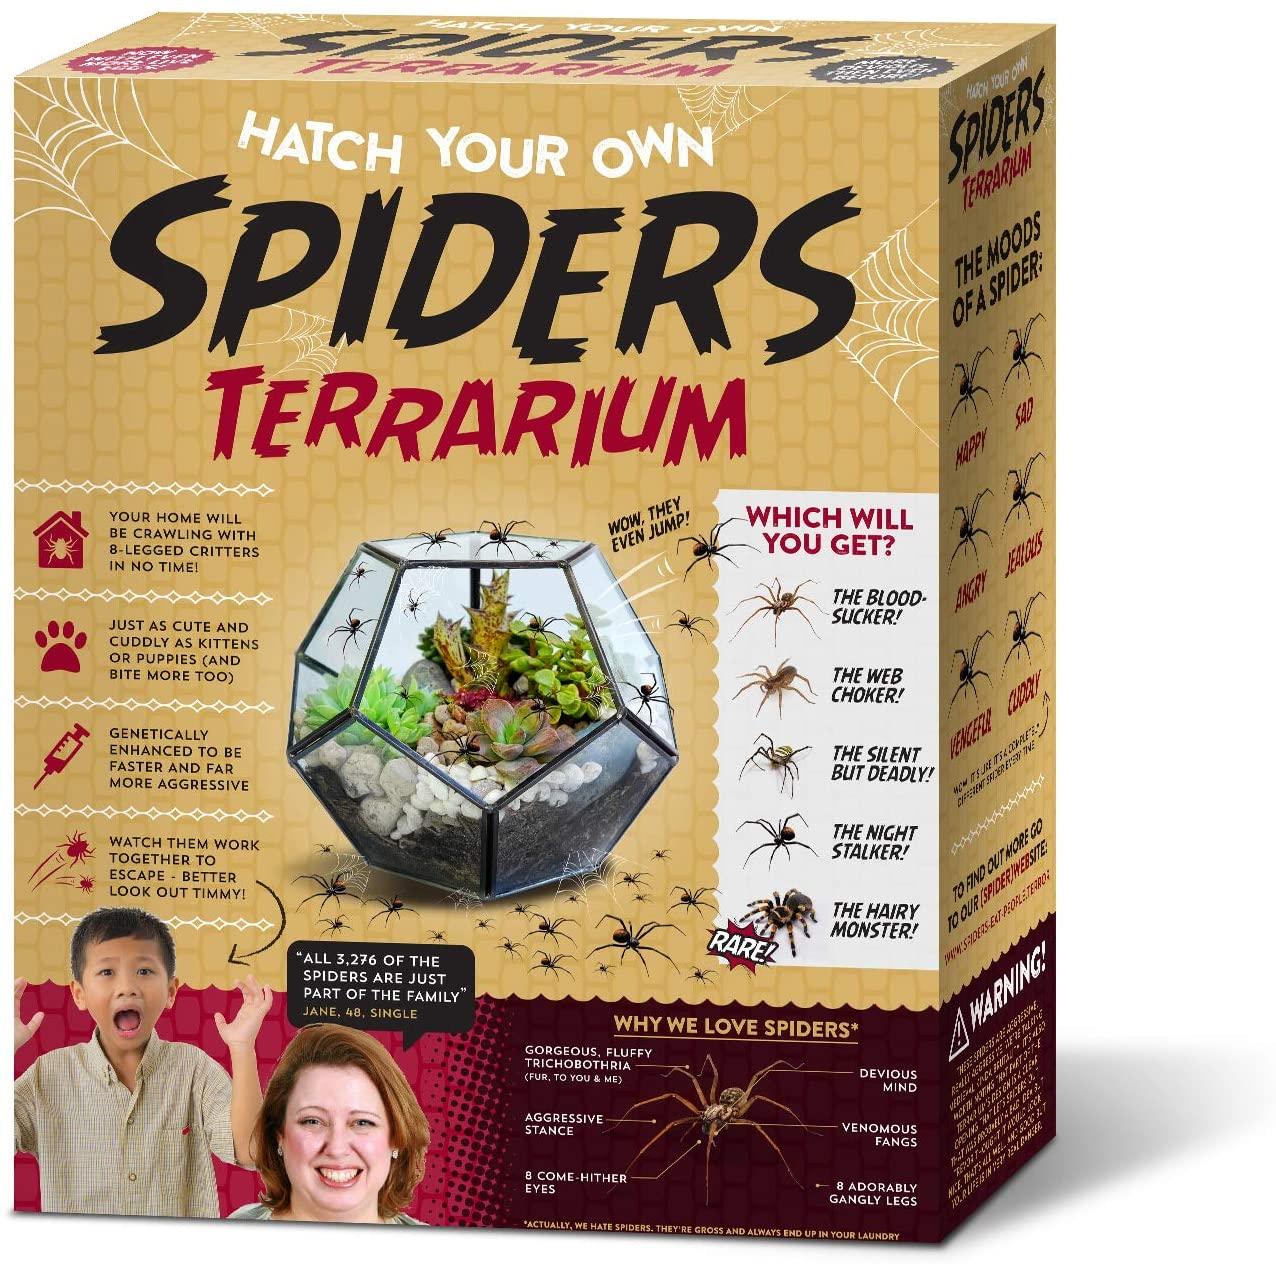 Hatch Your Own Spiders Terrarium